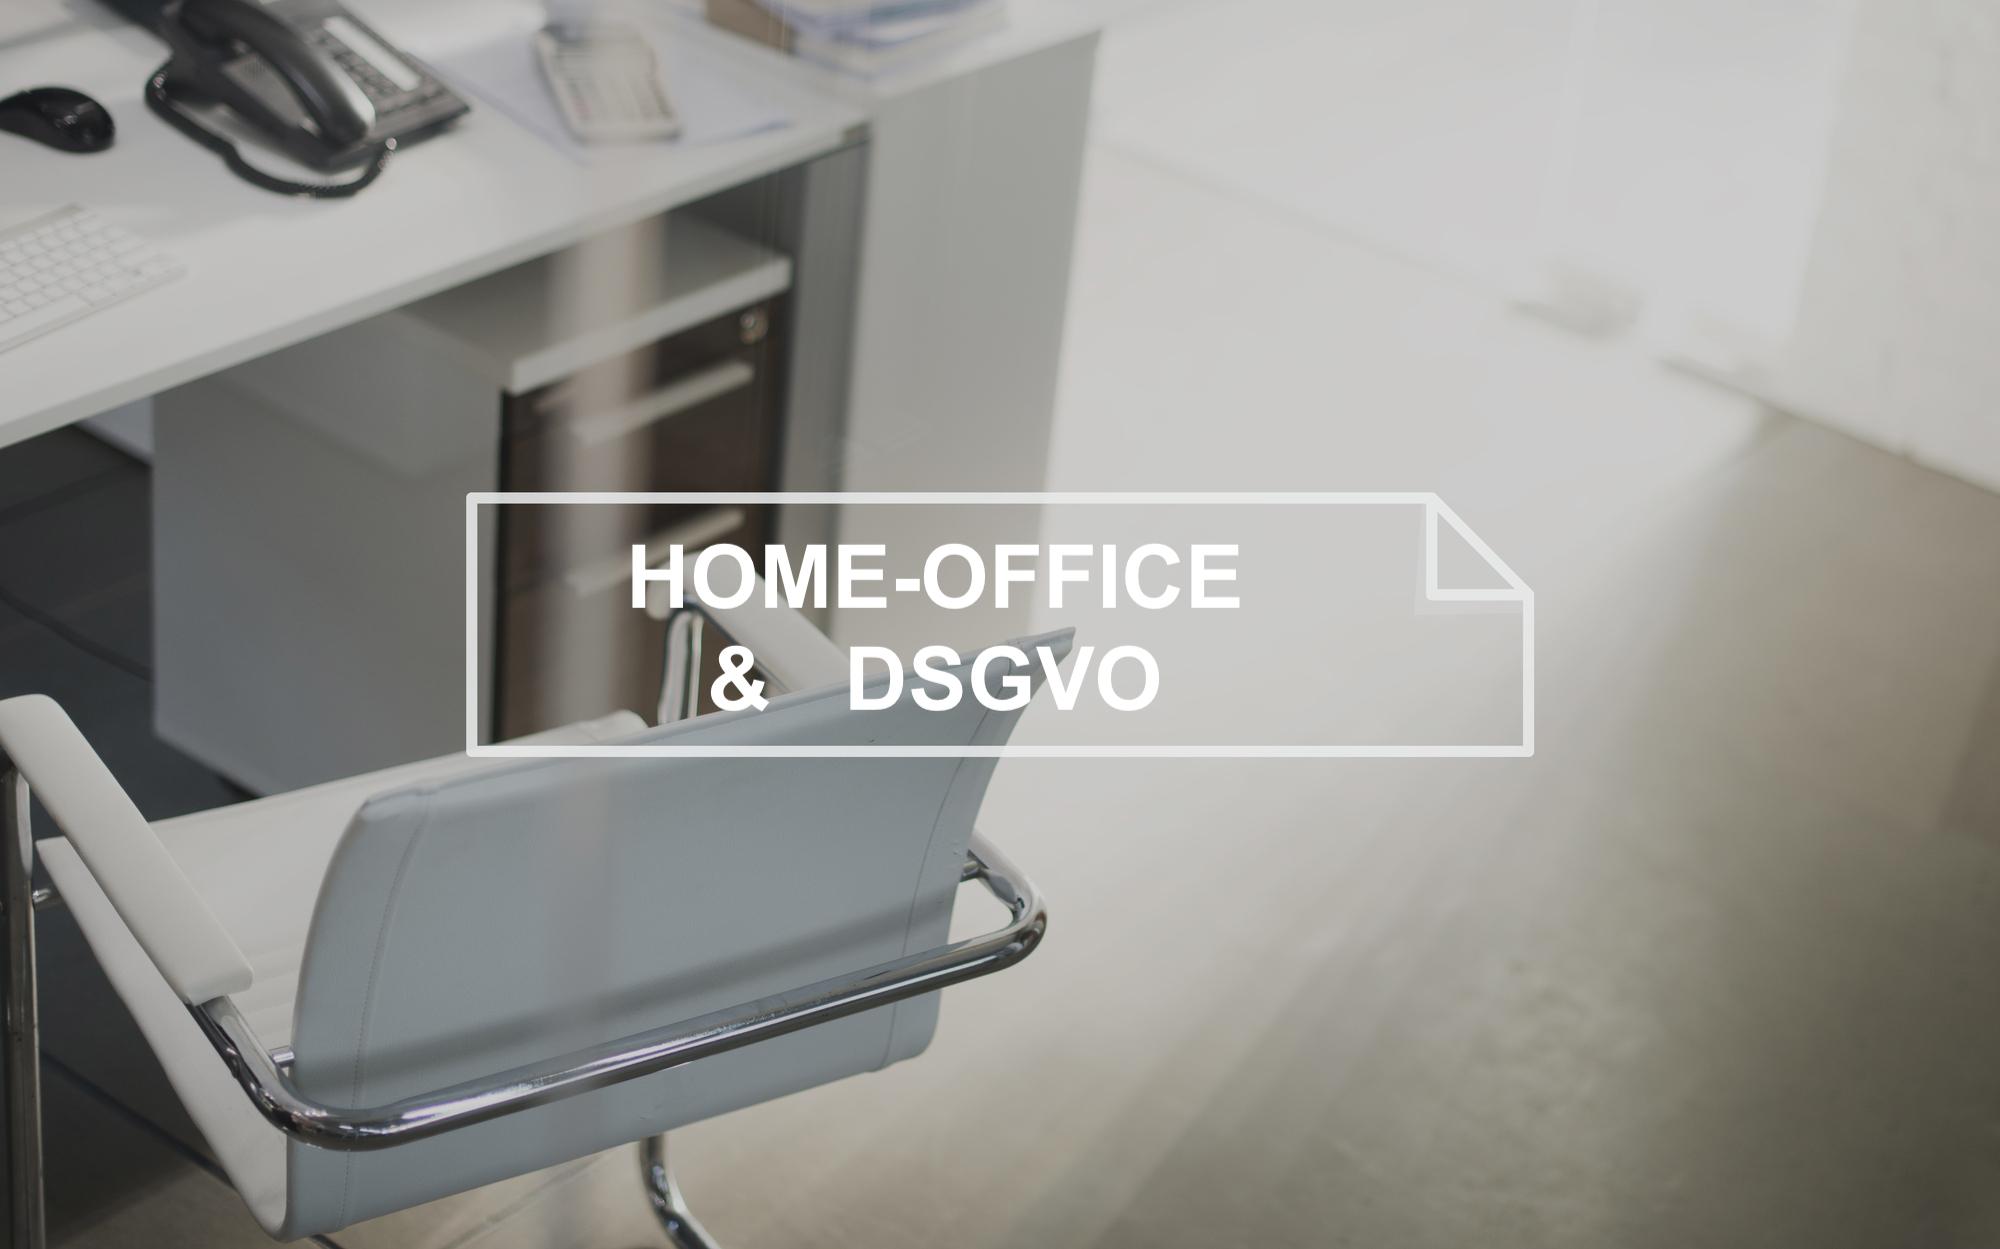 DSGVO - Homeoffice in Corona Pandemie